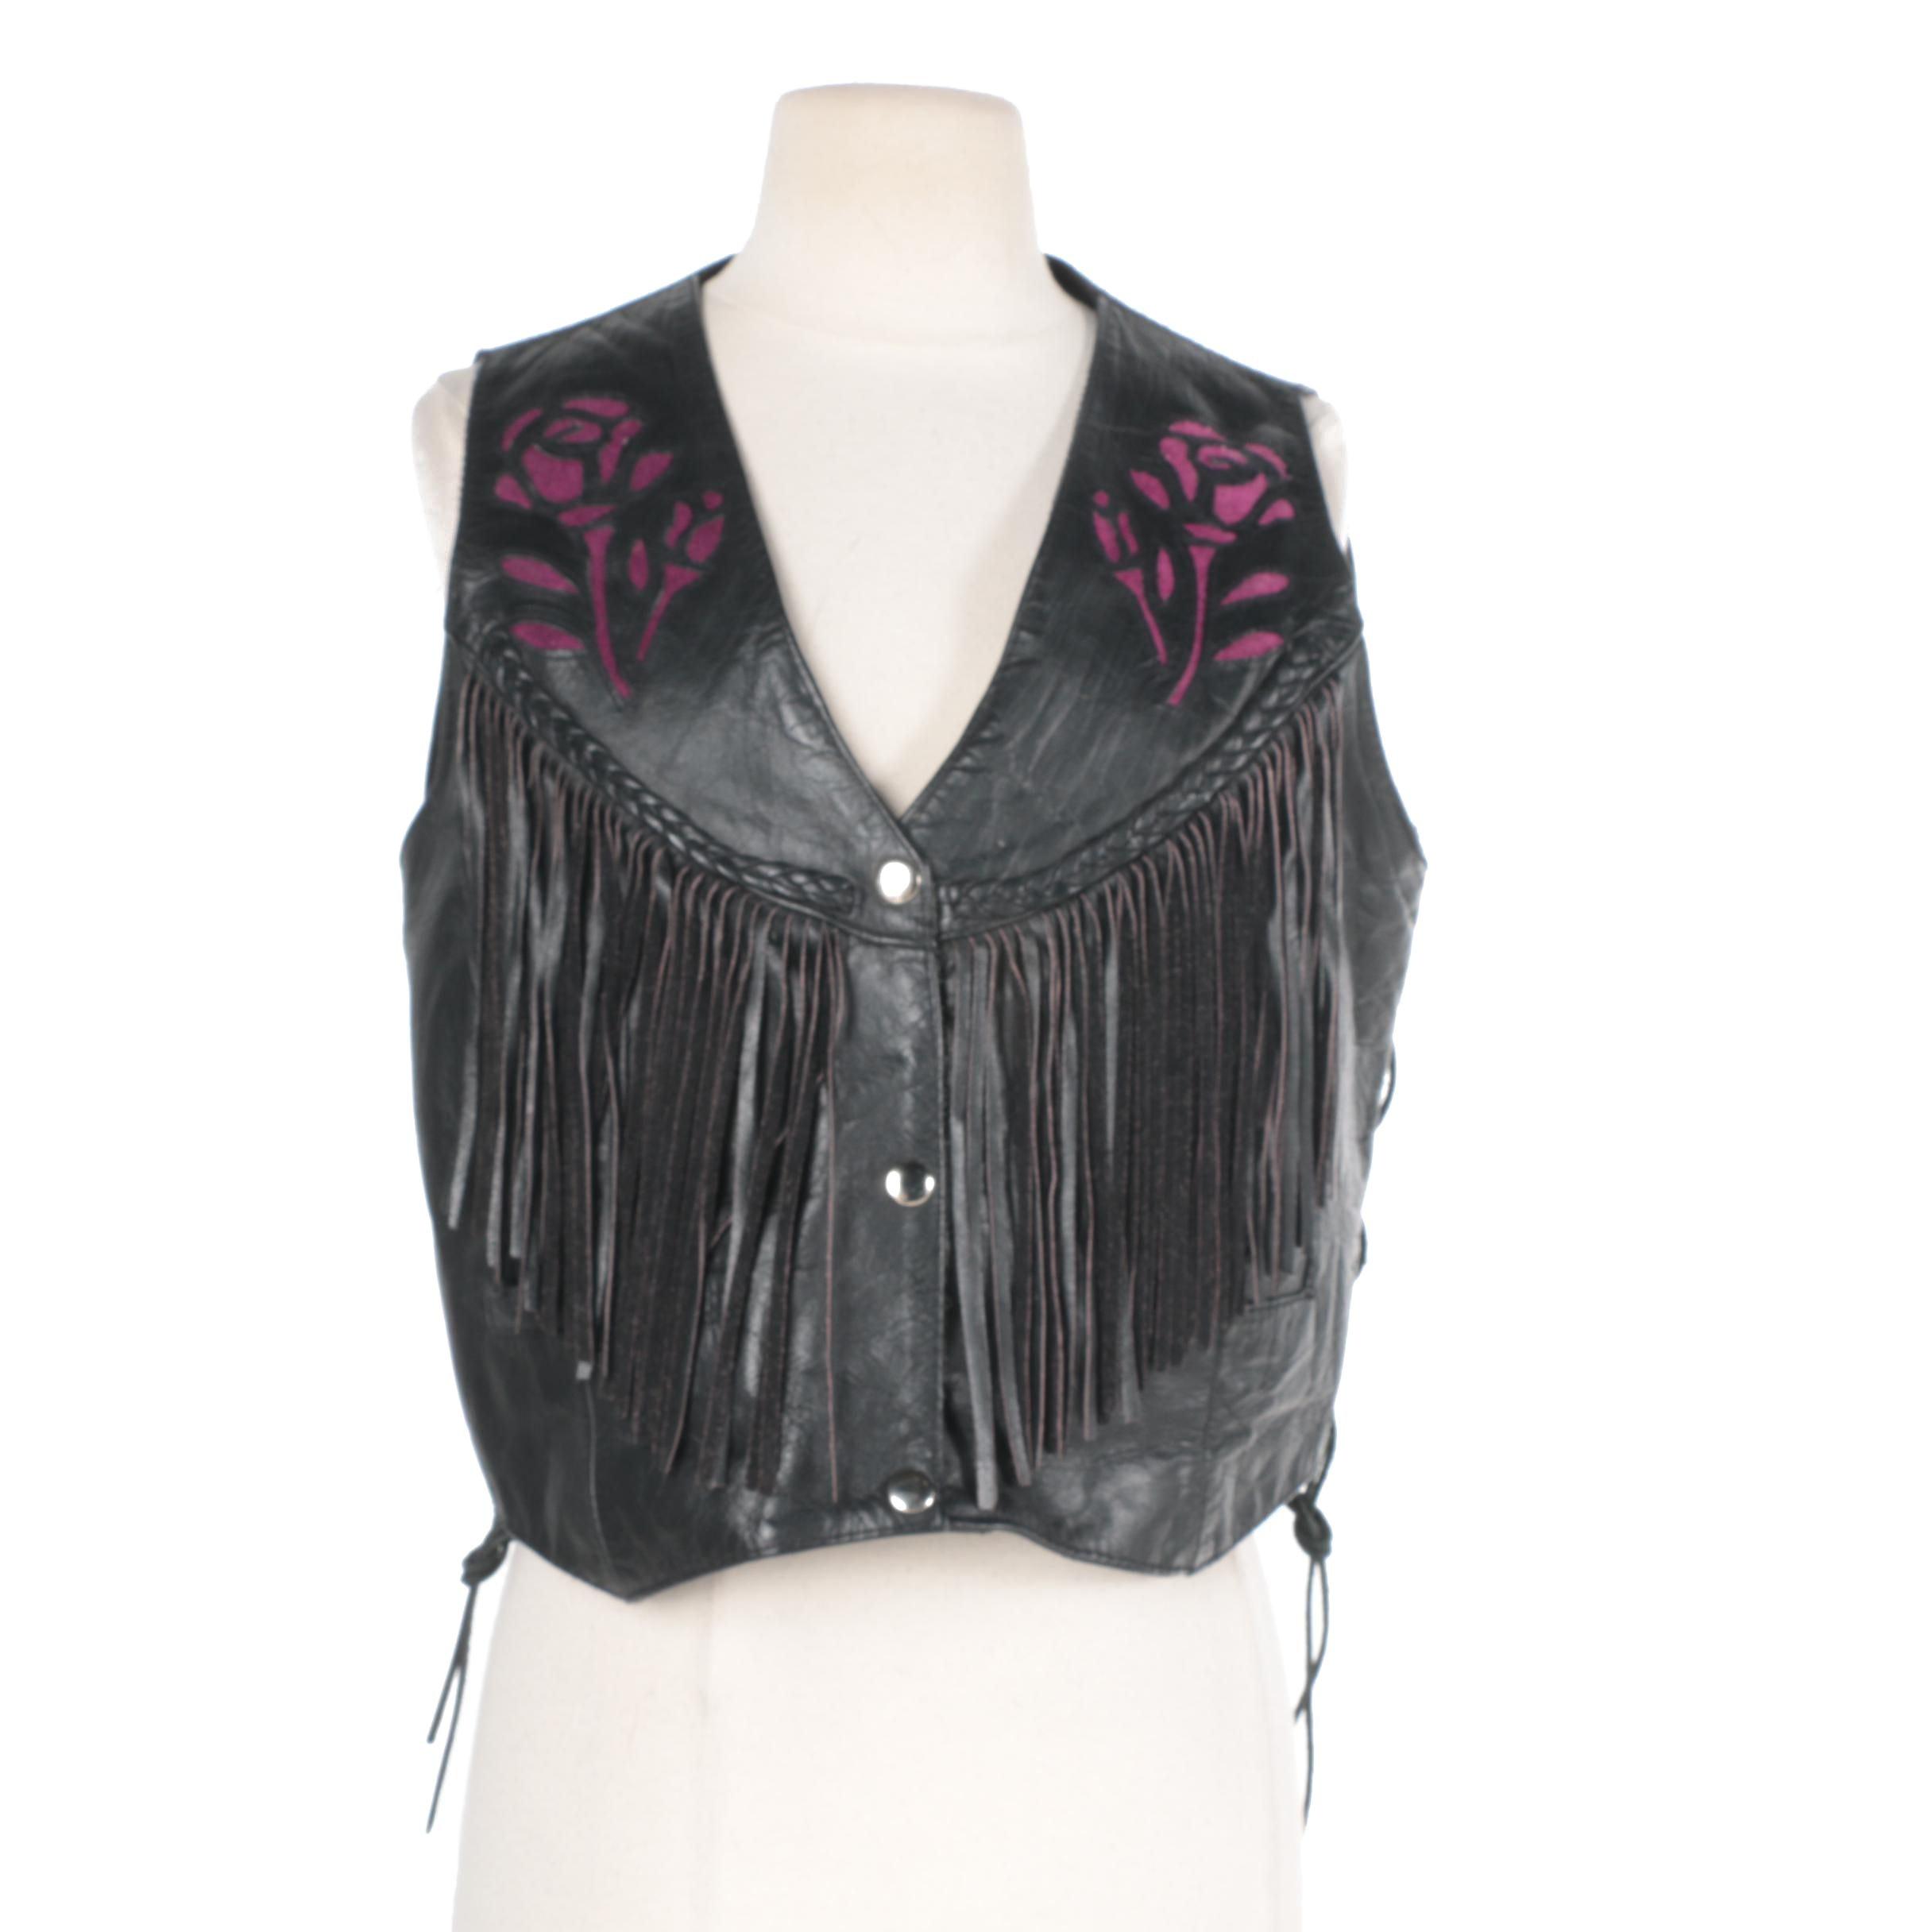 1990s Women's Hudson Leather Biker Vest with Suede Cutouts